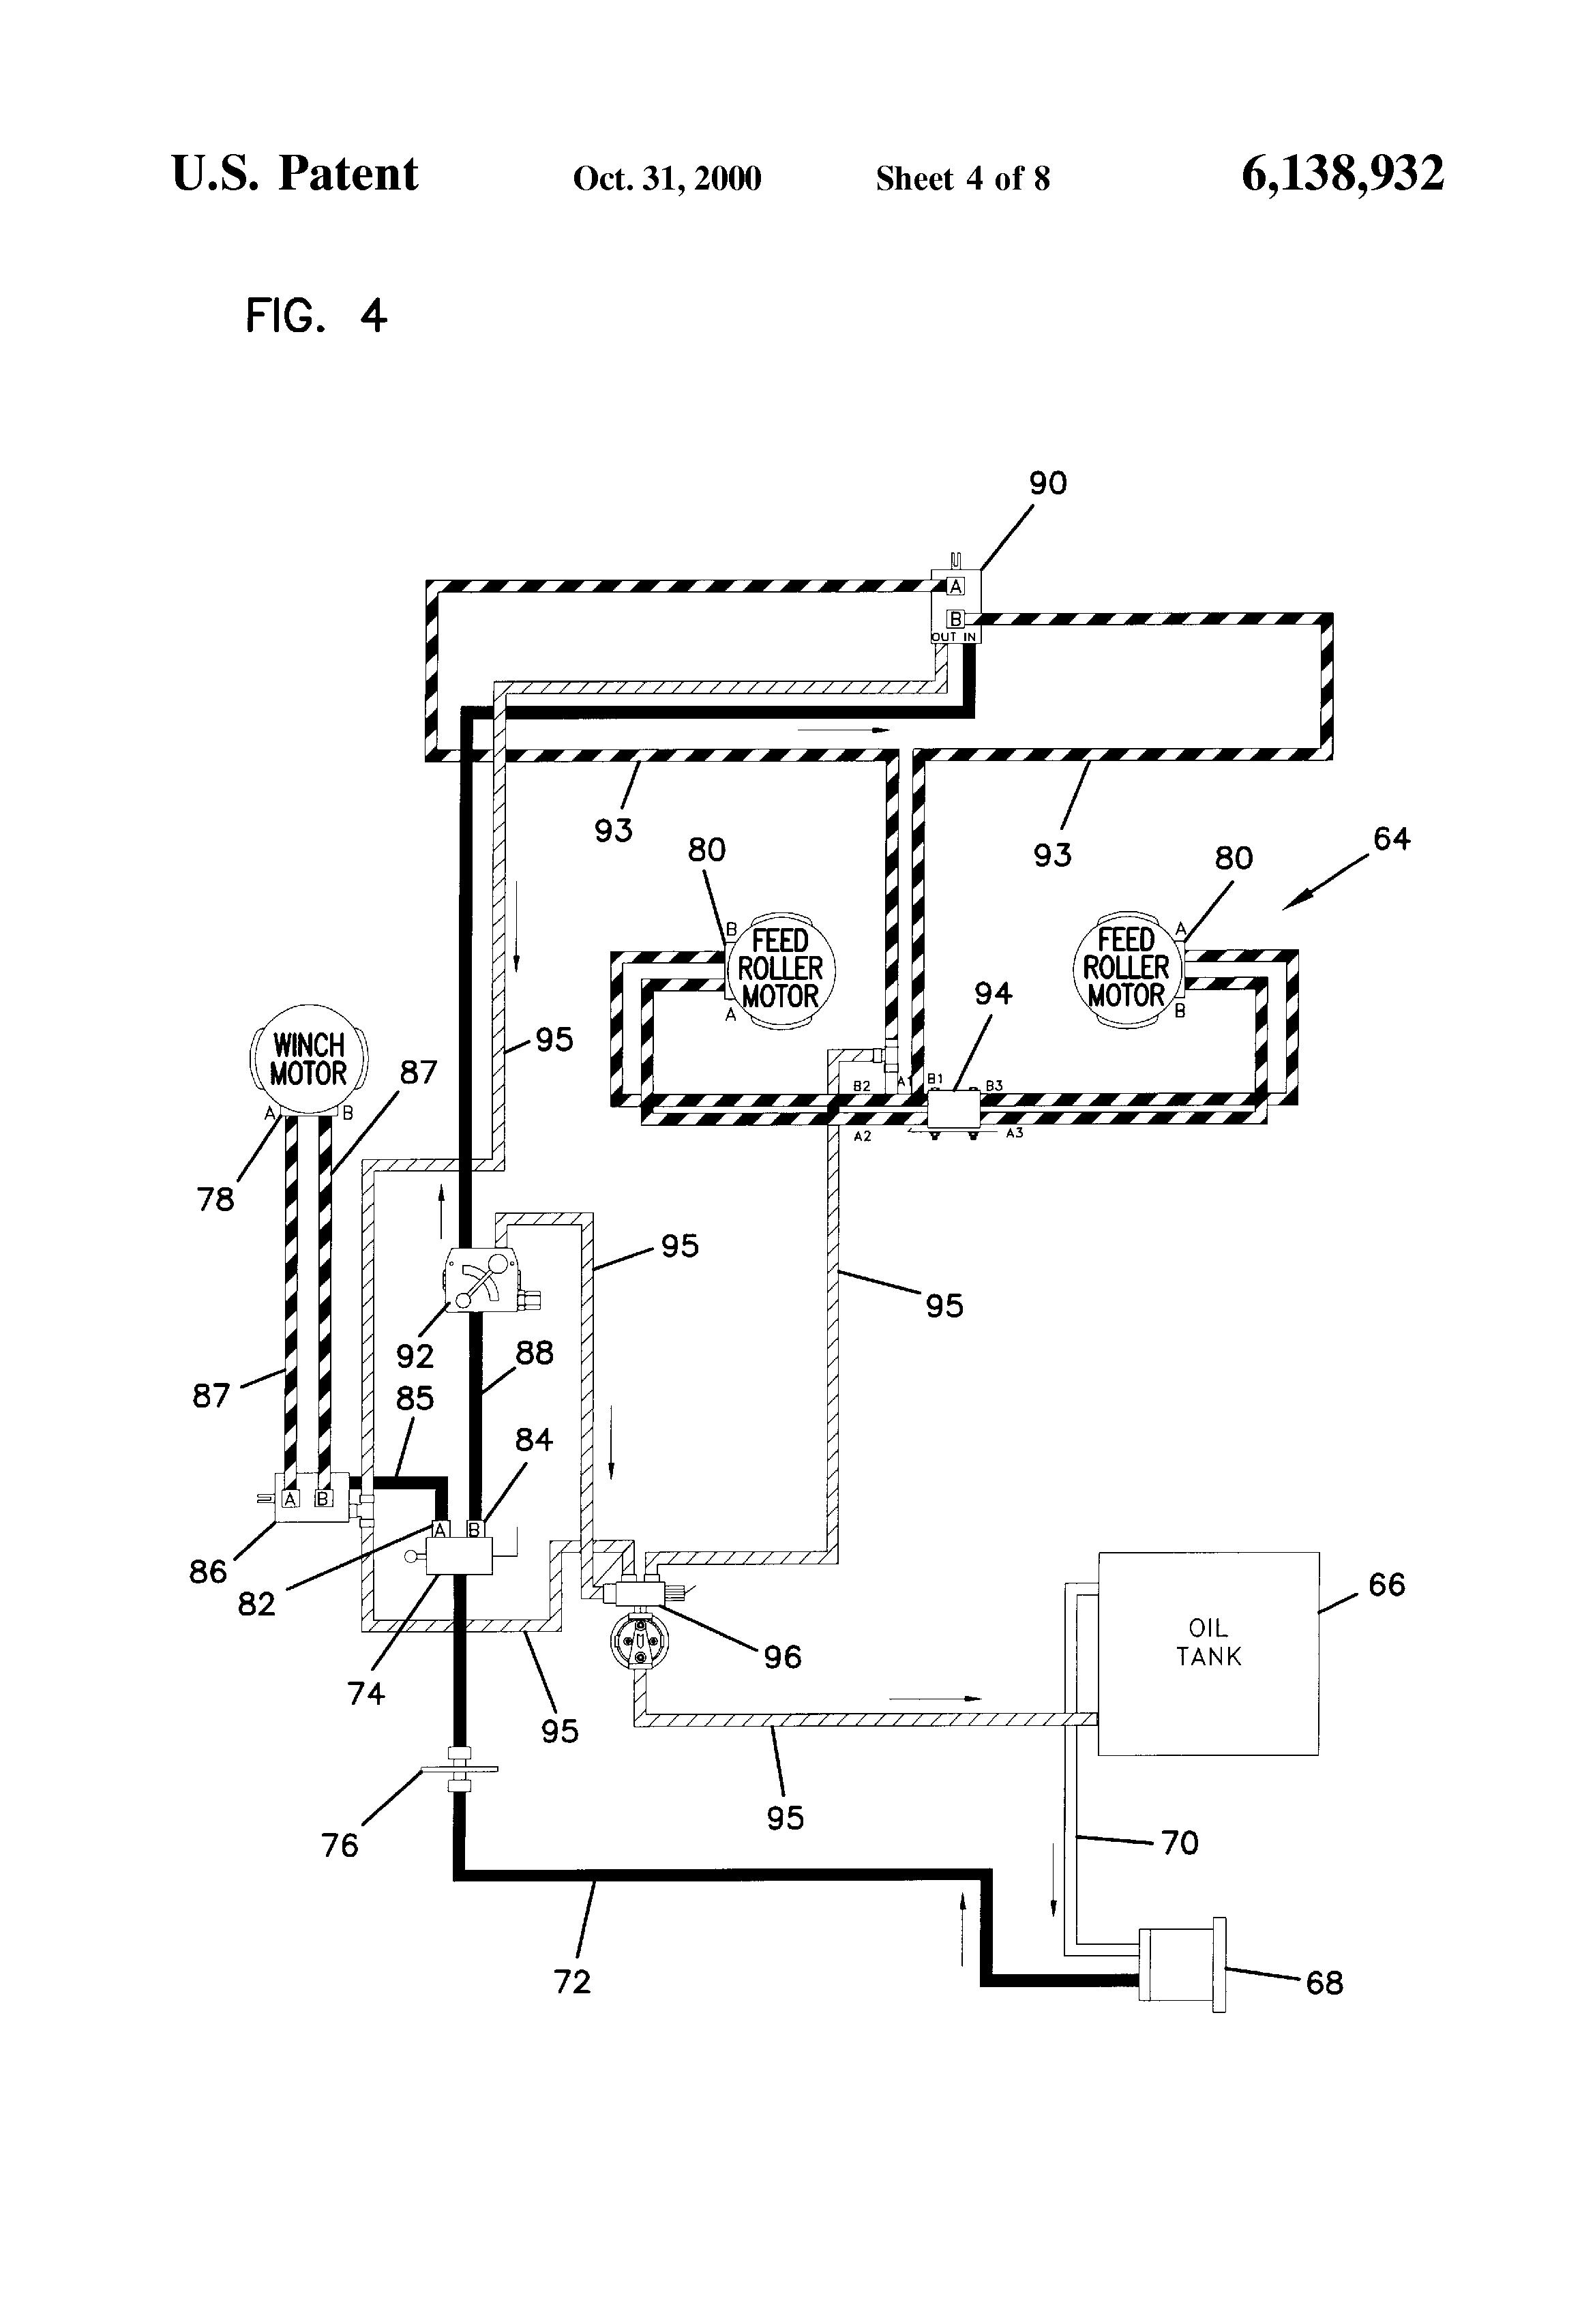 altec chipper wiring diagram apple wiring diagram